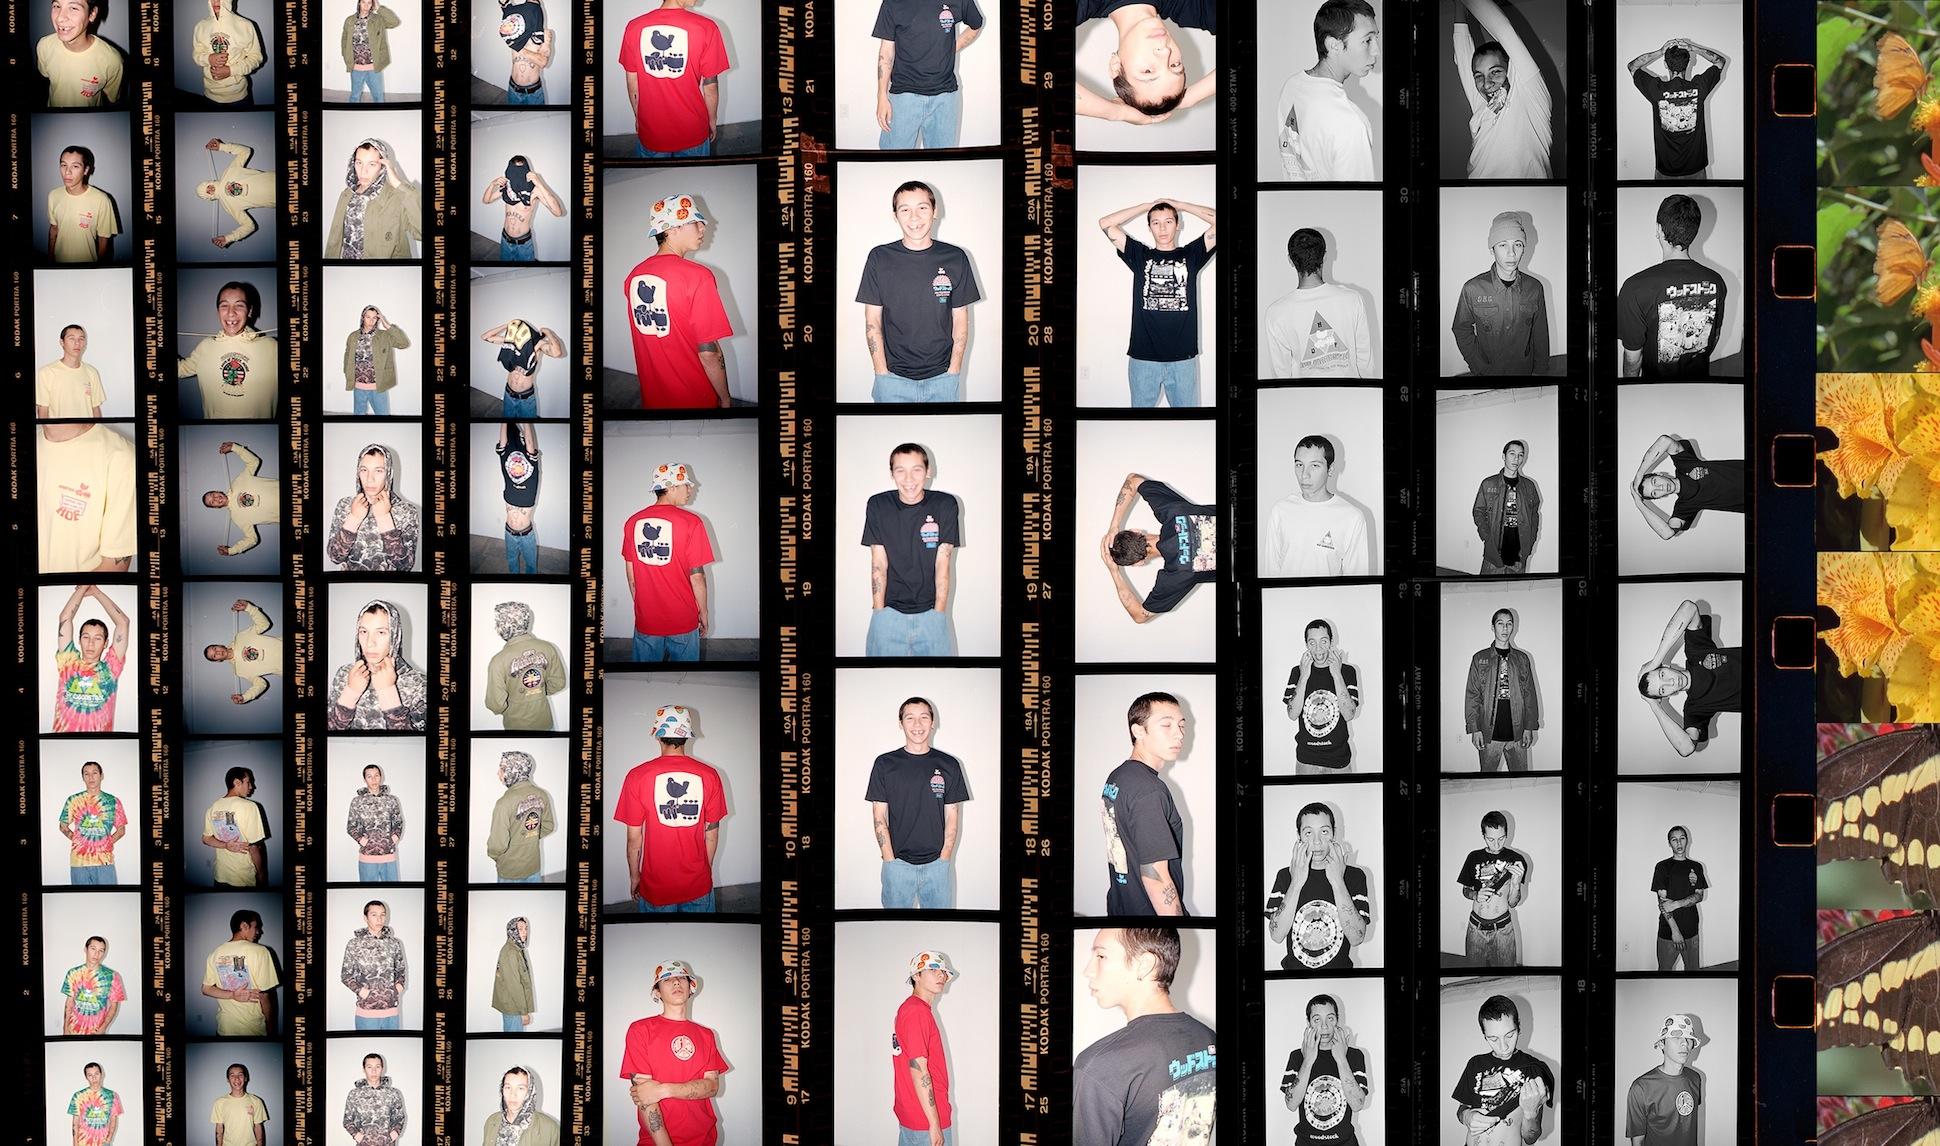 「WOODSTOCK」の50周年<br>HUFとコラボ新コレクション発表